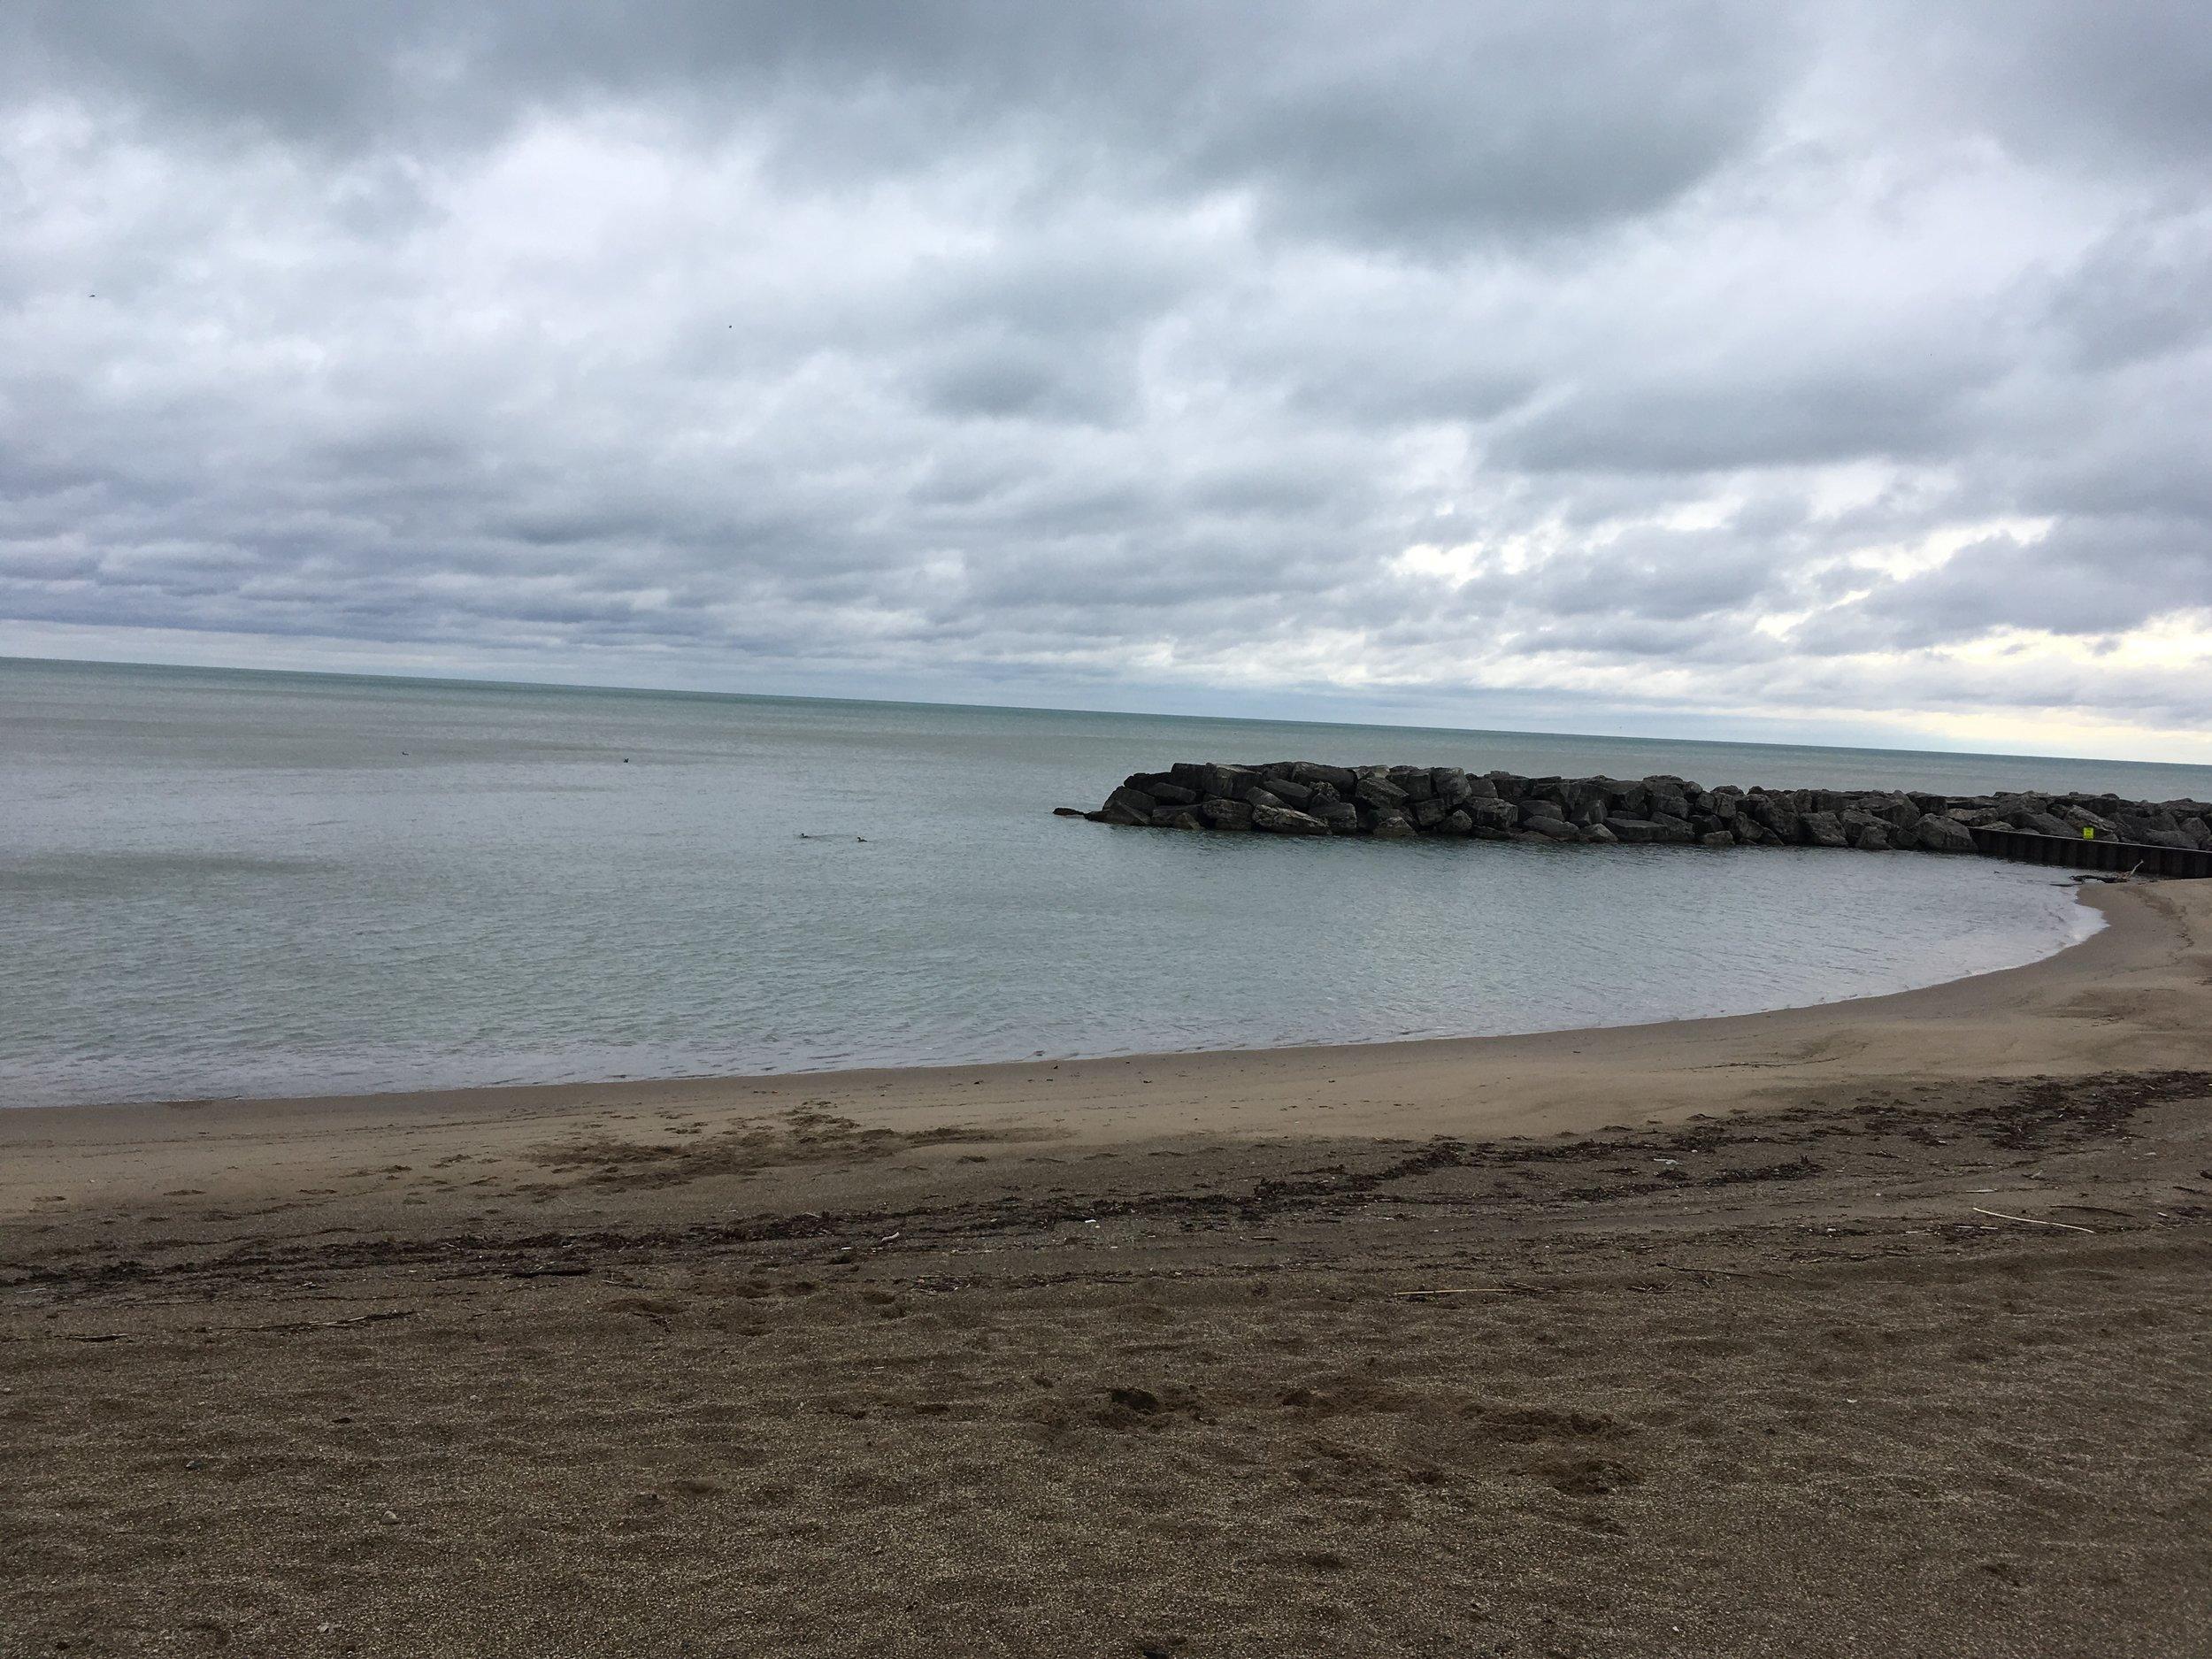 Lake Michigan, I can't quit you